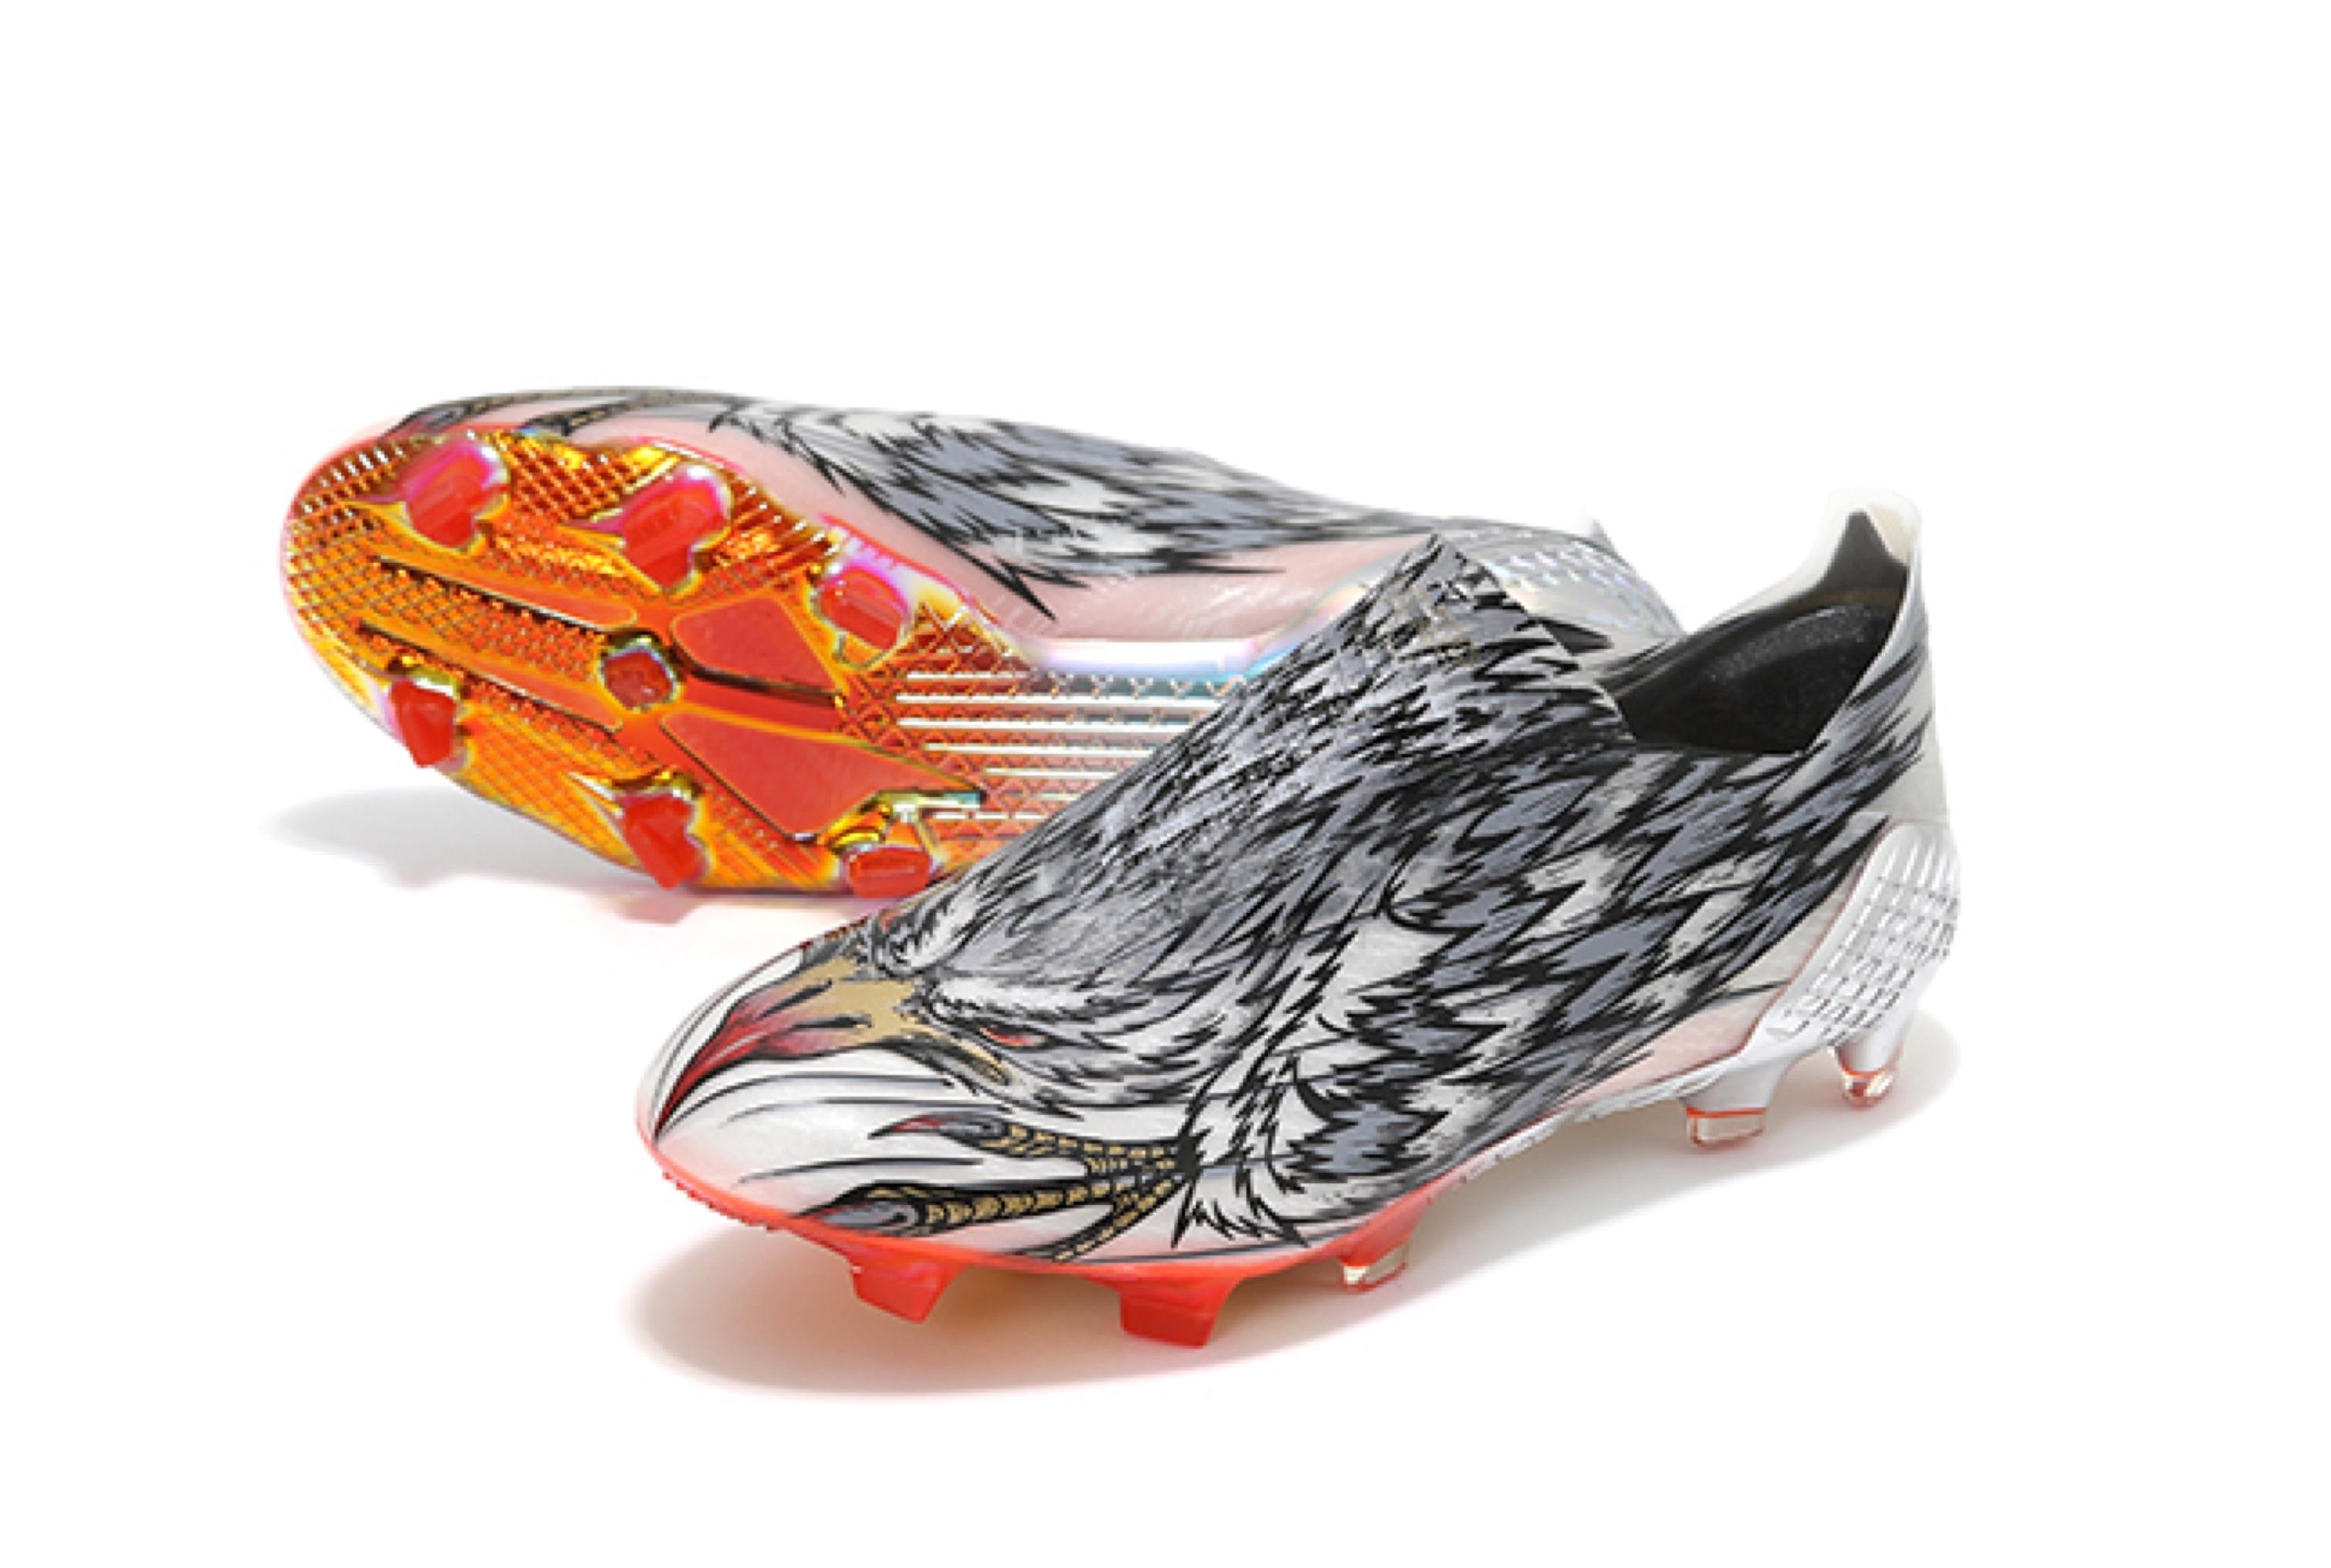 adidasから最速生物ハヤブサの名を冠した60足限定サッカーシューズ発売